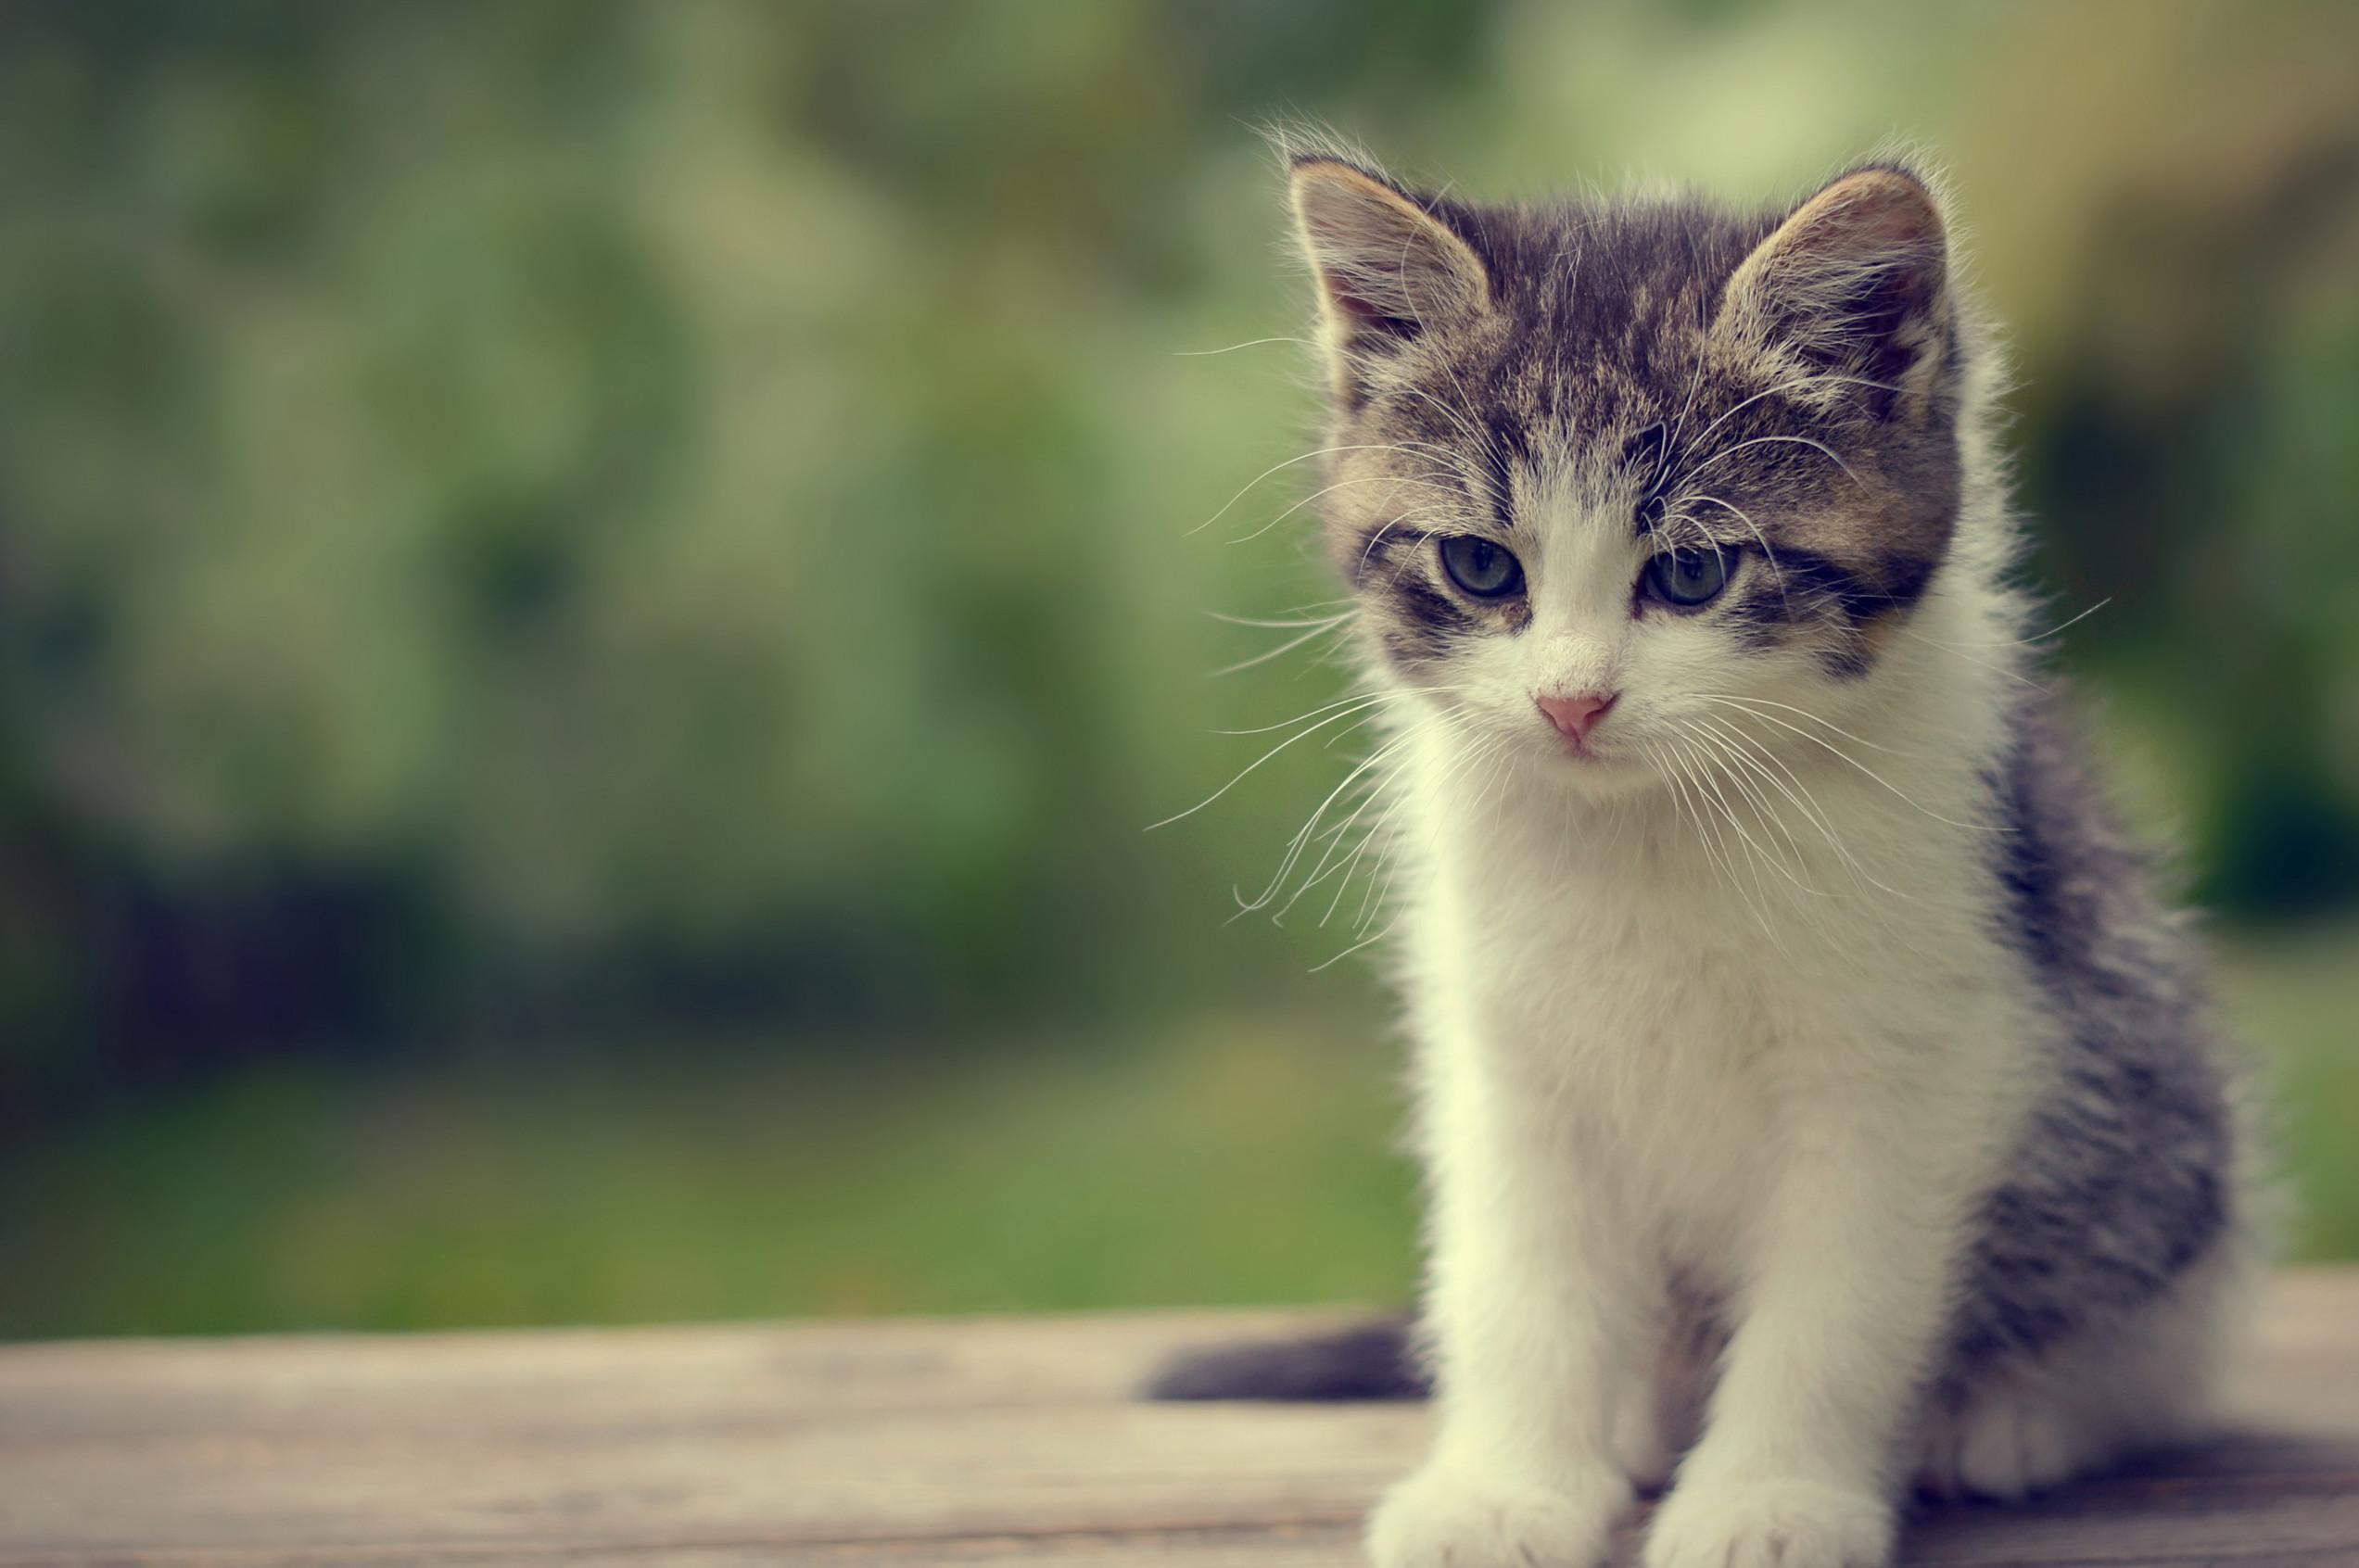 Cute Cat B:44-PI 100% Quality HD Wallpapers